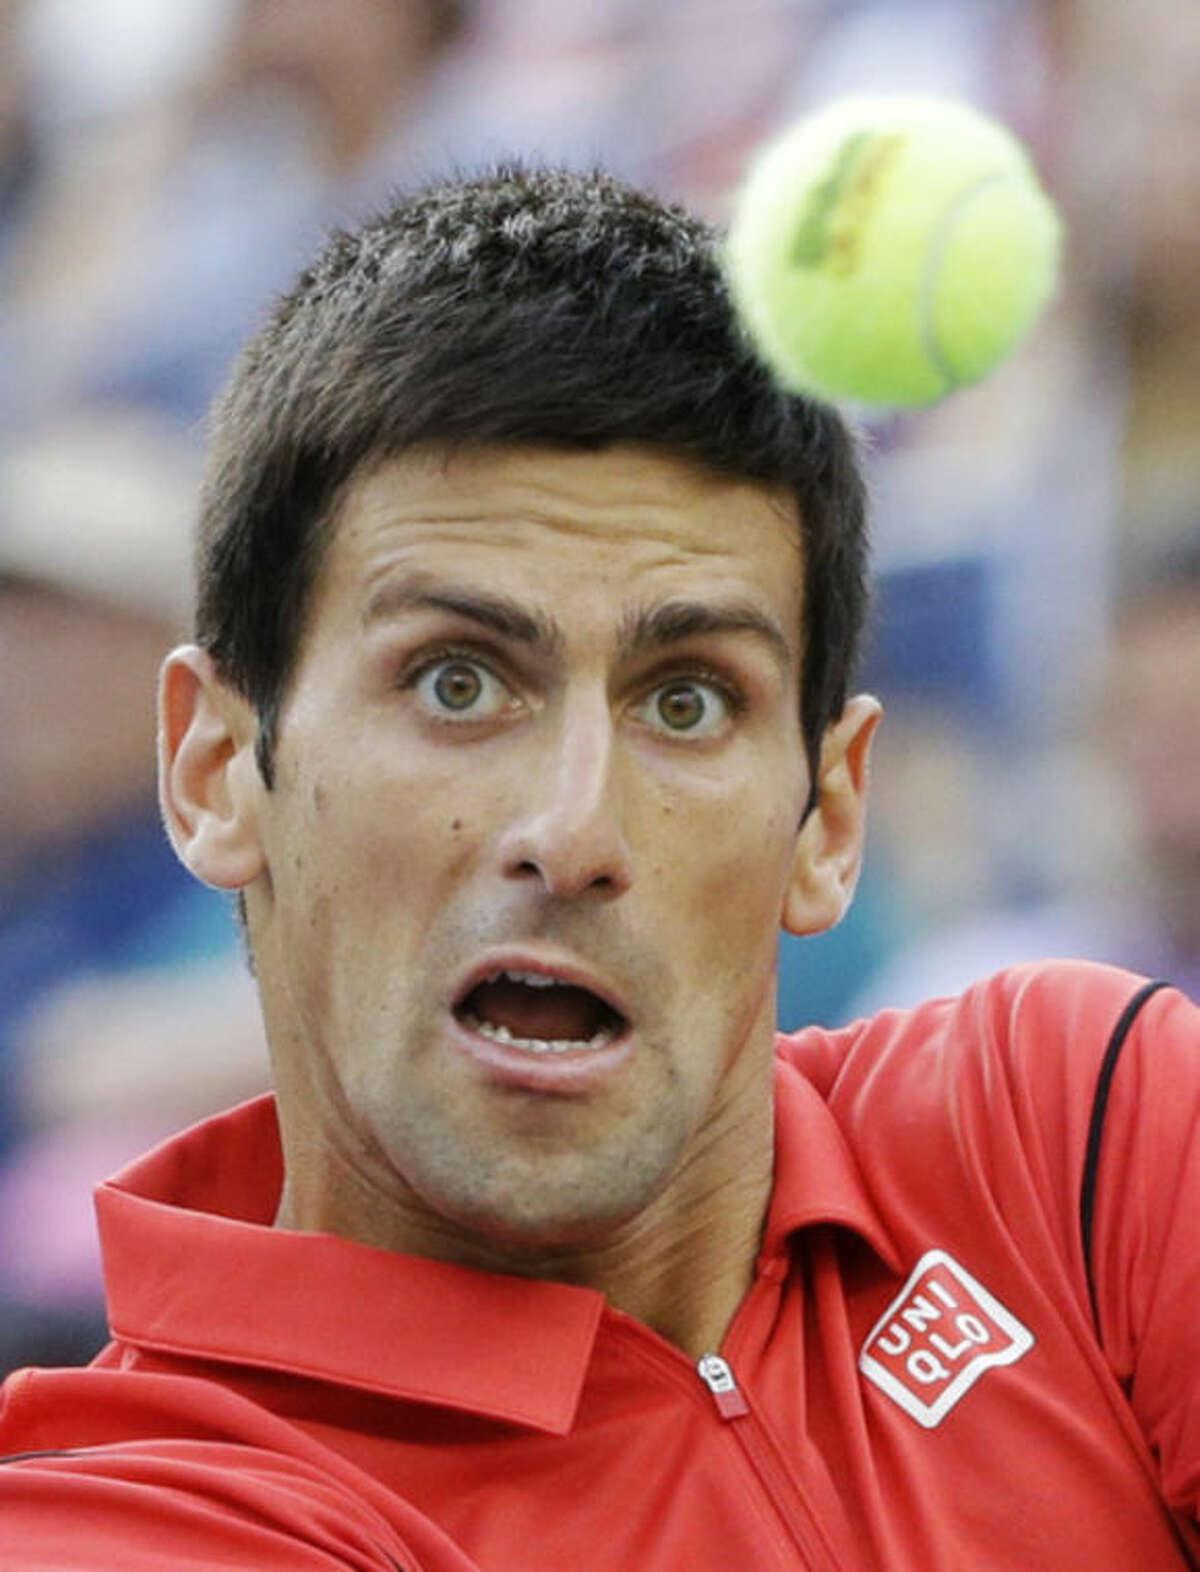 Novak Djokovic, of Serbia, returns a shot to Rafael Nadal, of Spain, during the men's singles final of the 2013 U.S. Open tennis tournament, Monday, Sept. 9, 2013, in New York. (AP Photo/David Goldman)